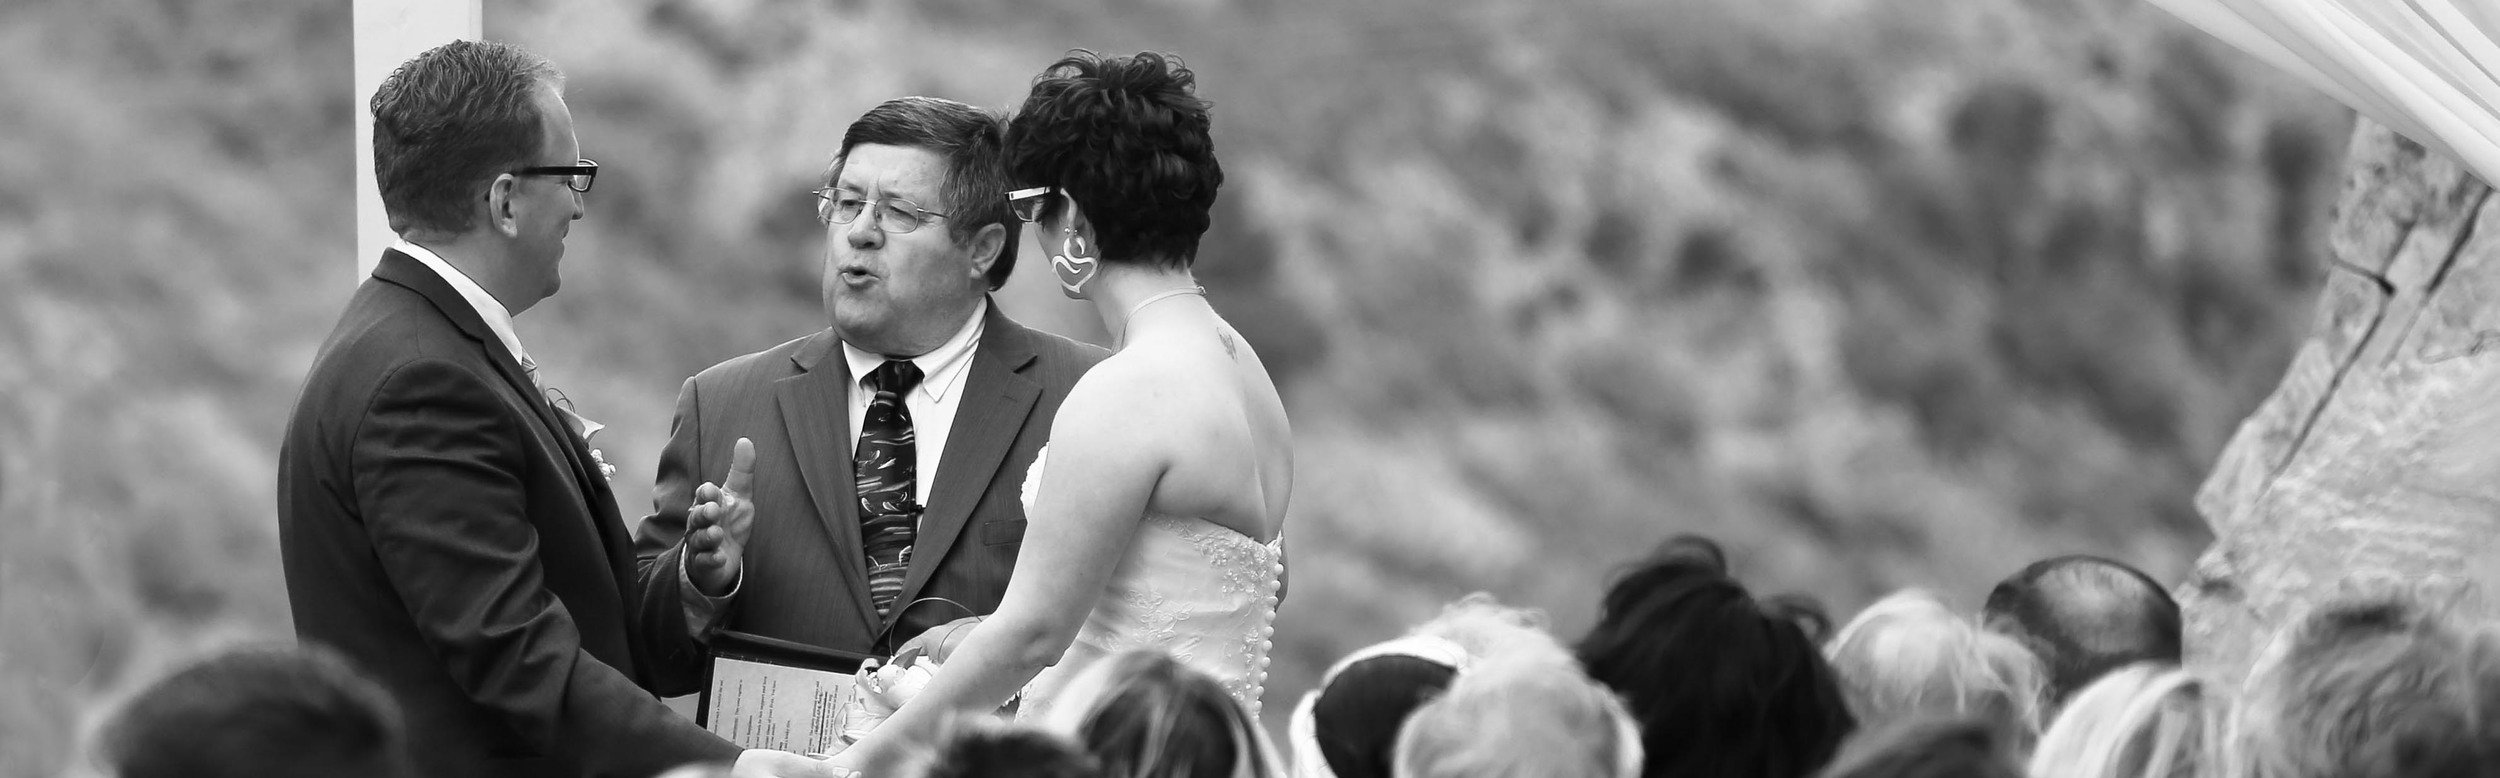 Salt Lake City Wedding Photography